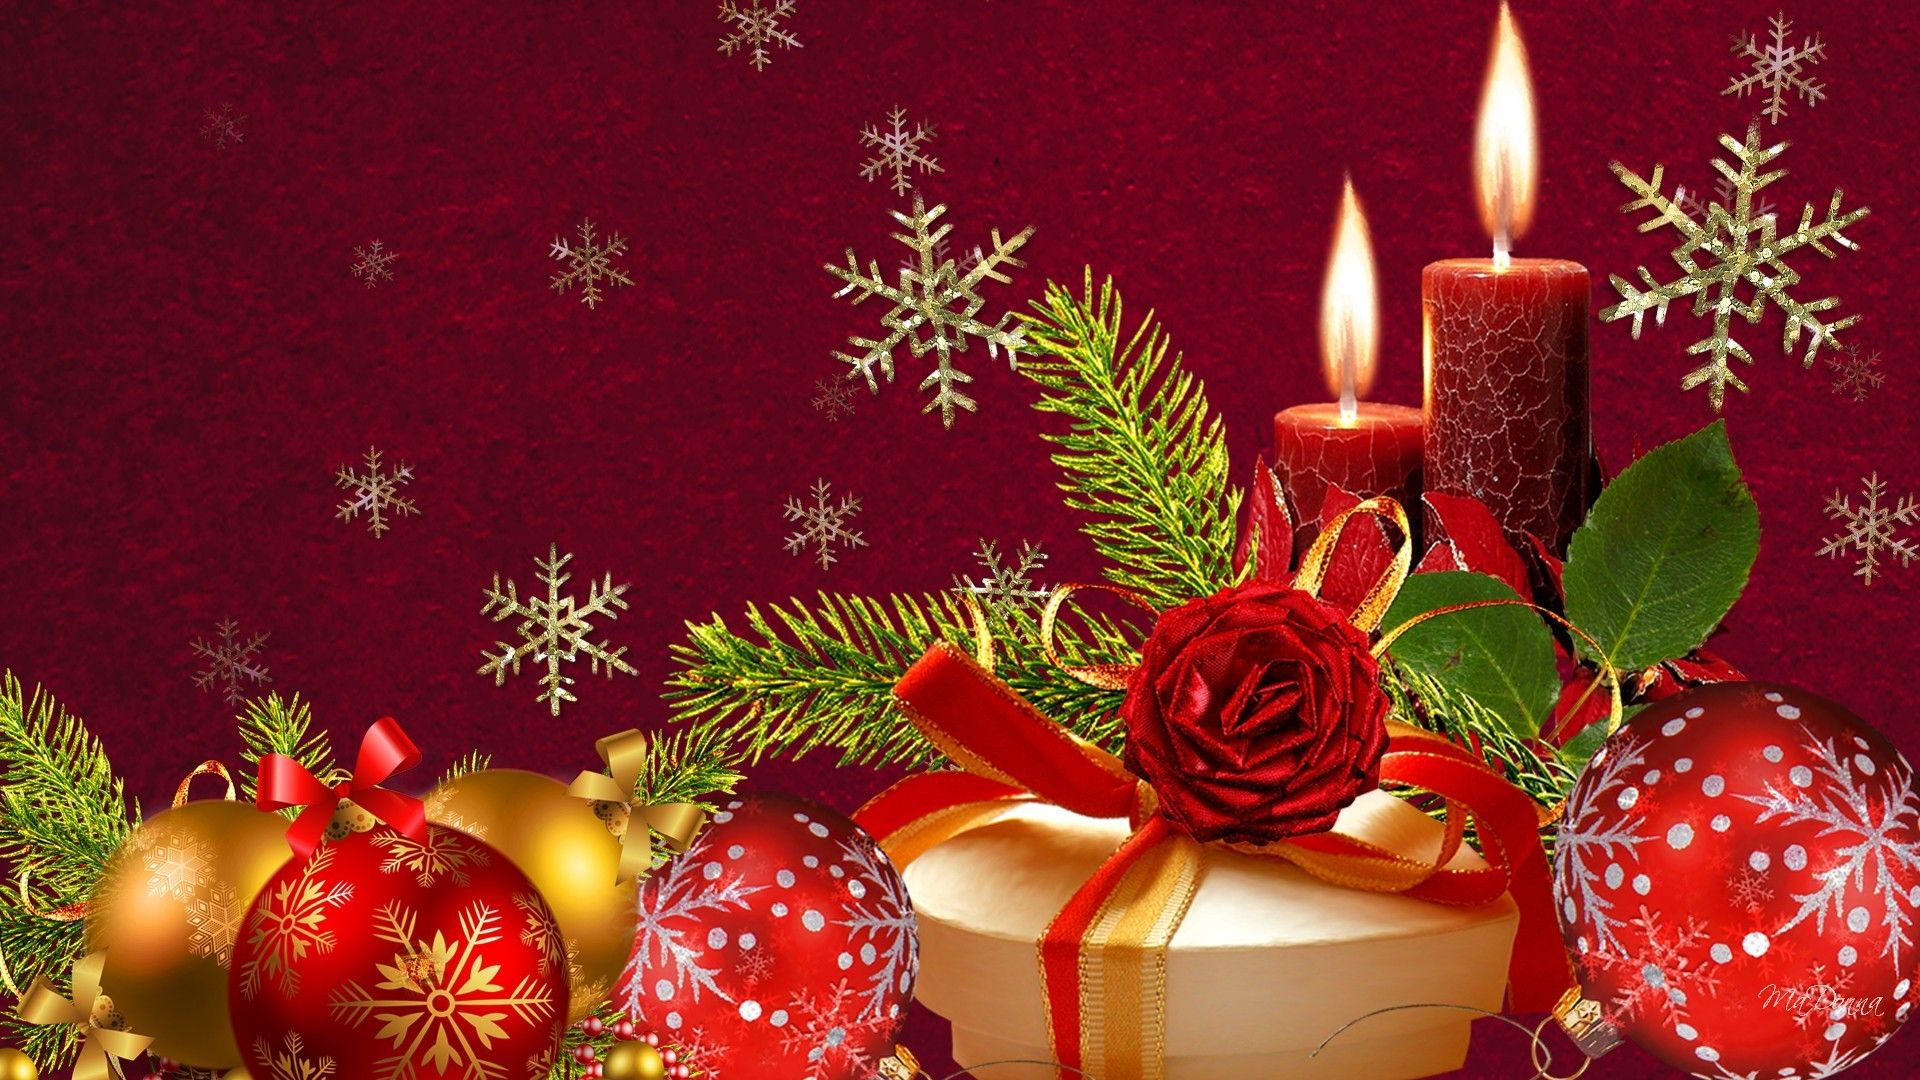 Amazing Wallpaper Music Christmas - e3bbf4a7a6258ac3804f290849f24e83  Collection_446960.jpg